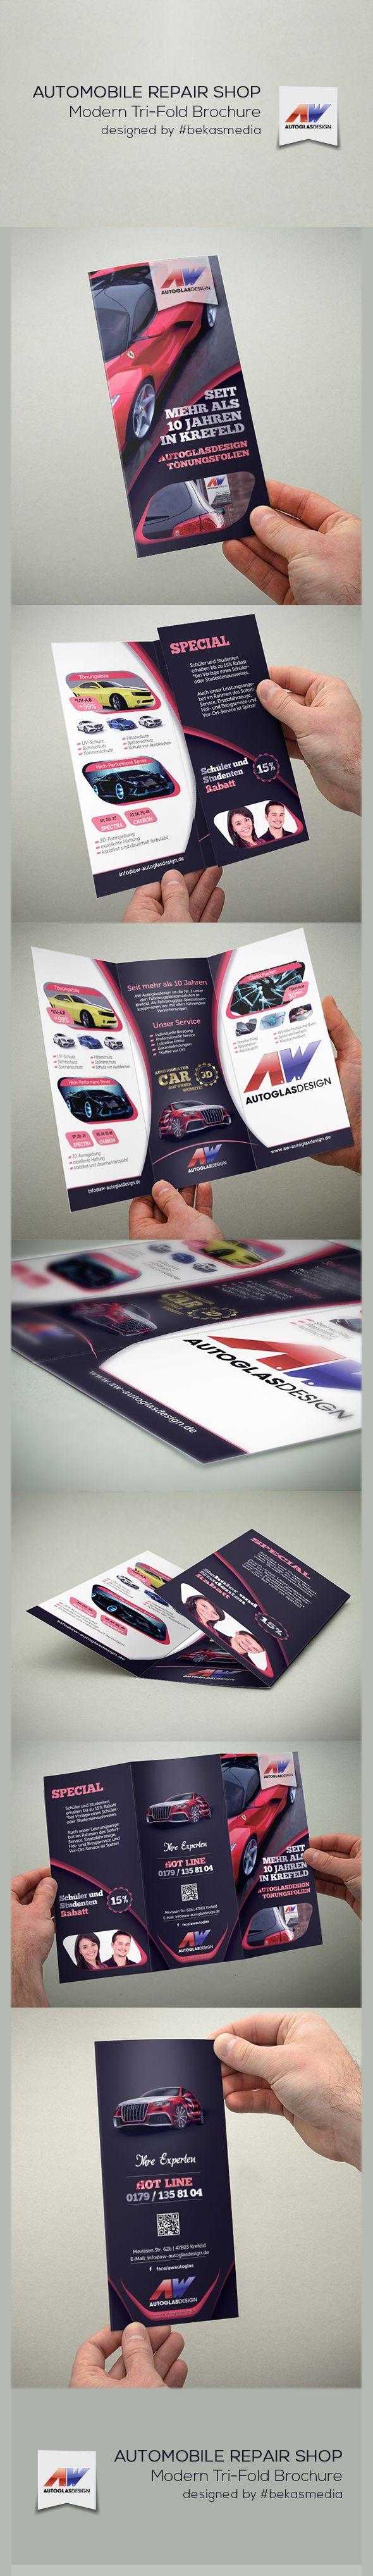 Modern #Automobile Repair Shop #TriFold Brochure. DIN Lang. Designed by #bekasmedia.